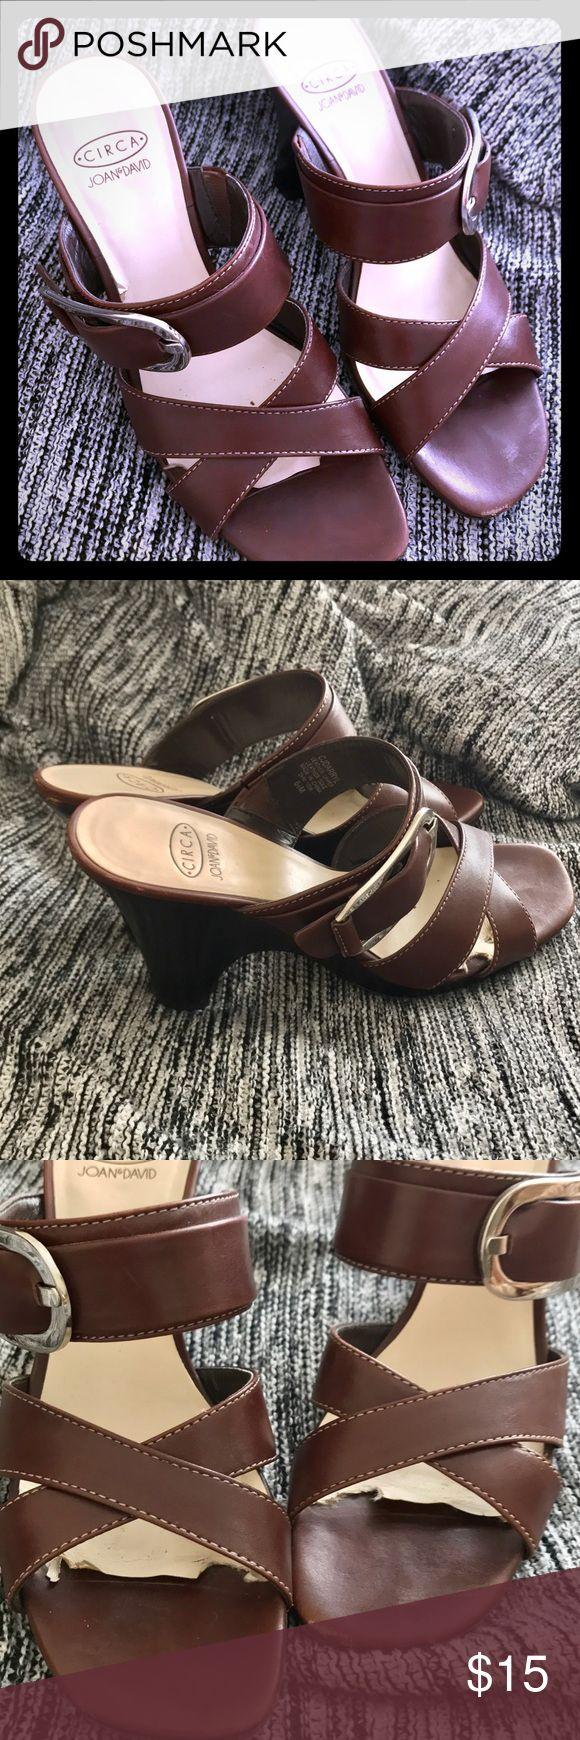 Joan & David Brown Heels With Silver Buckle 6.5 Circa by Joan & David Brown Heels With Silver Buckle 6.5 Joan & David Shoes Heels